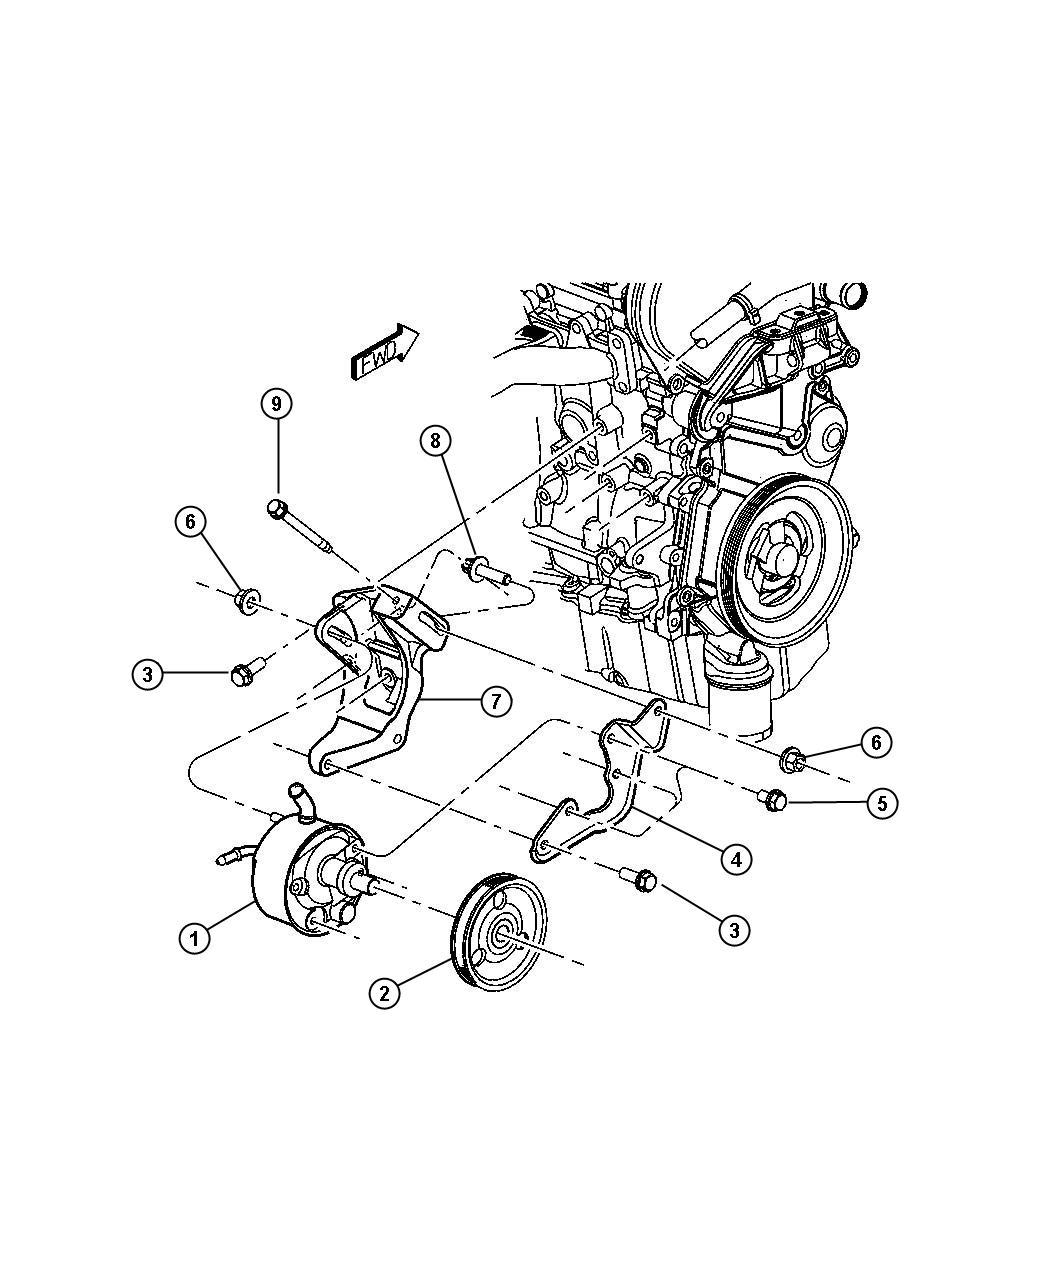 Chrysler Voyager Pulley Power Steering Pump Engine